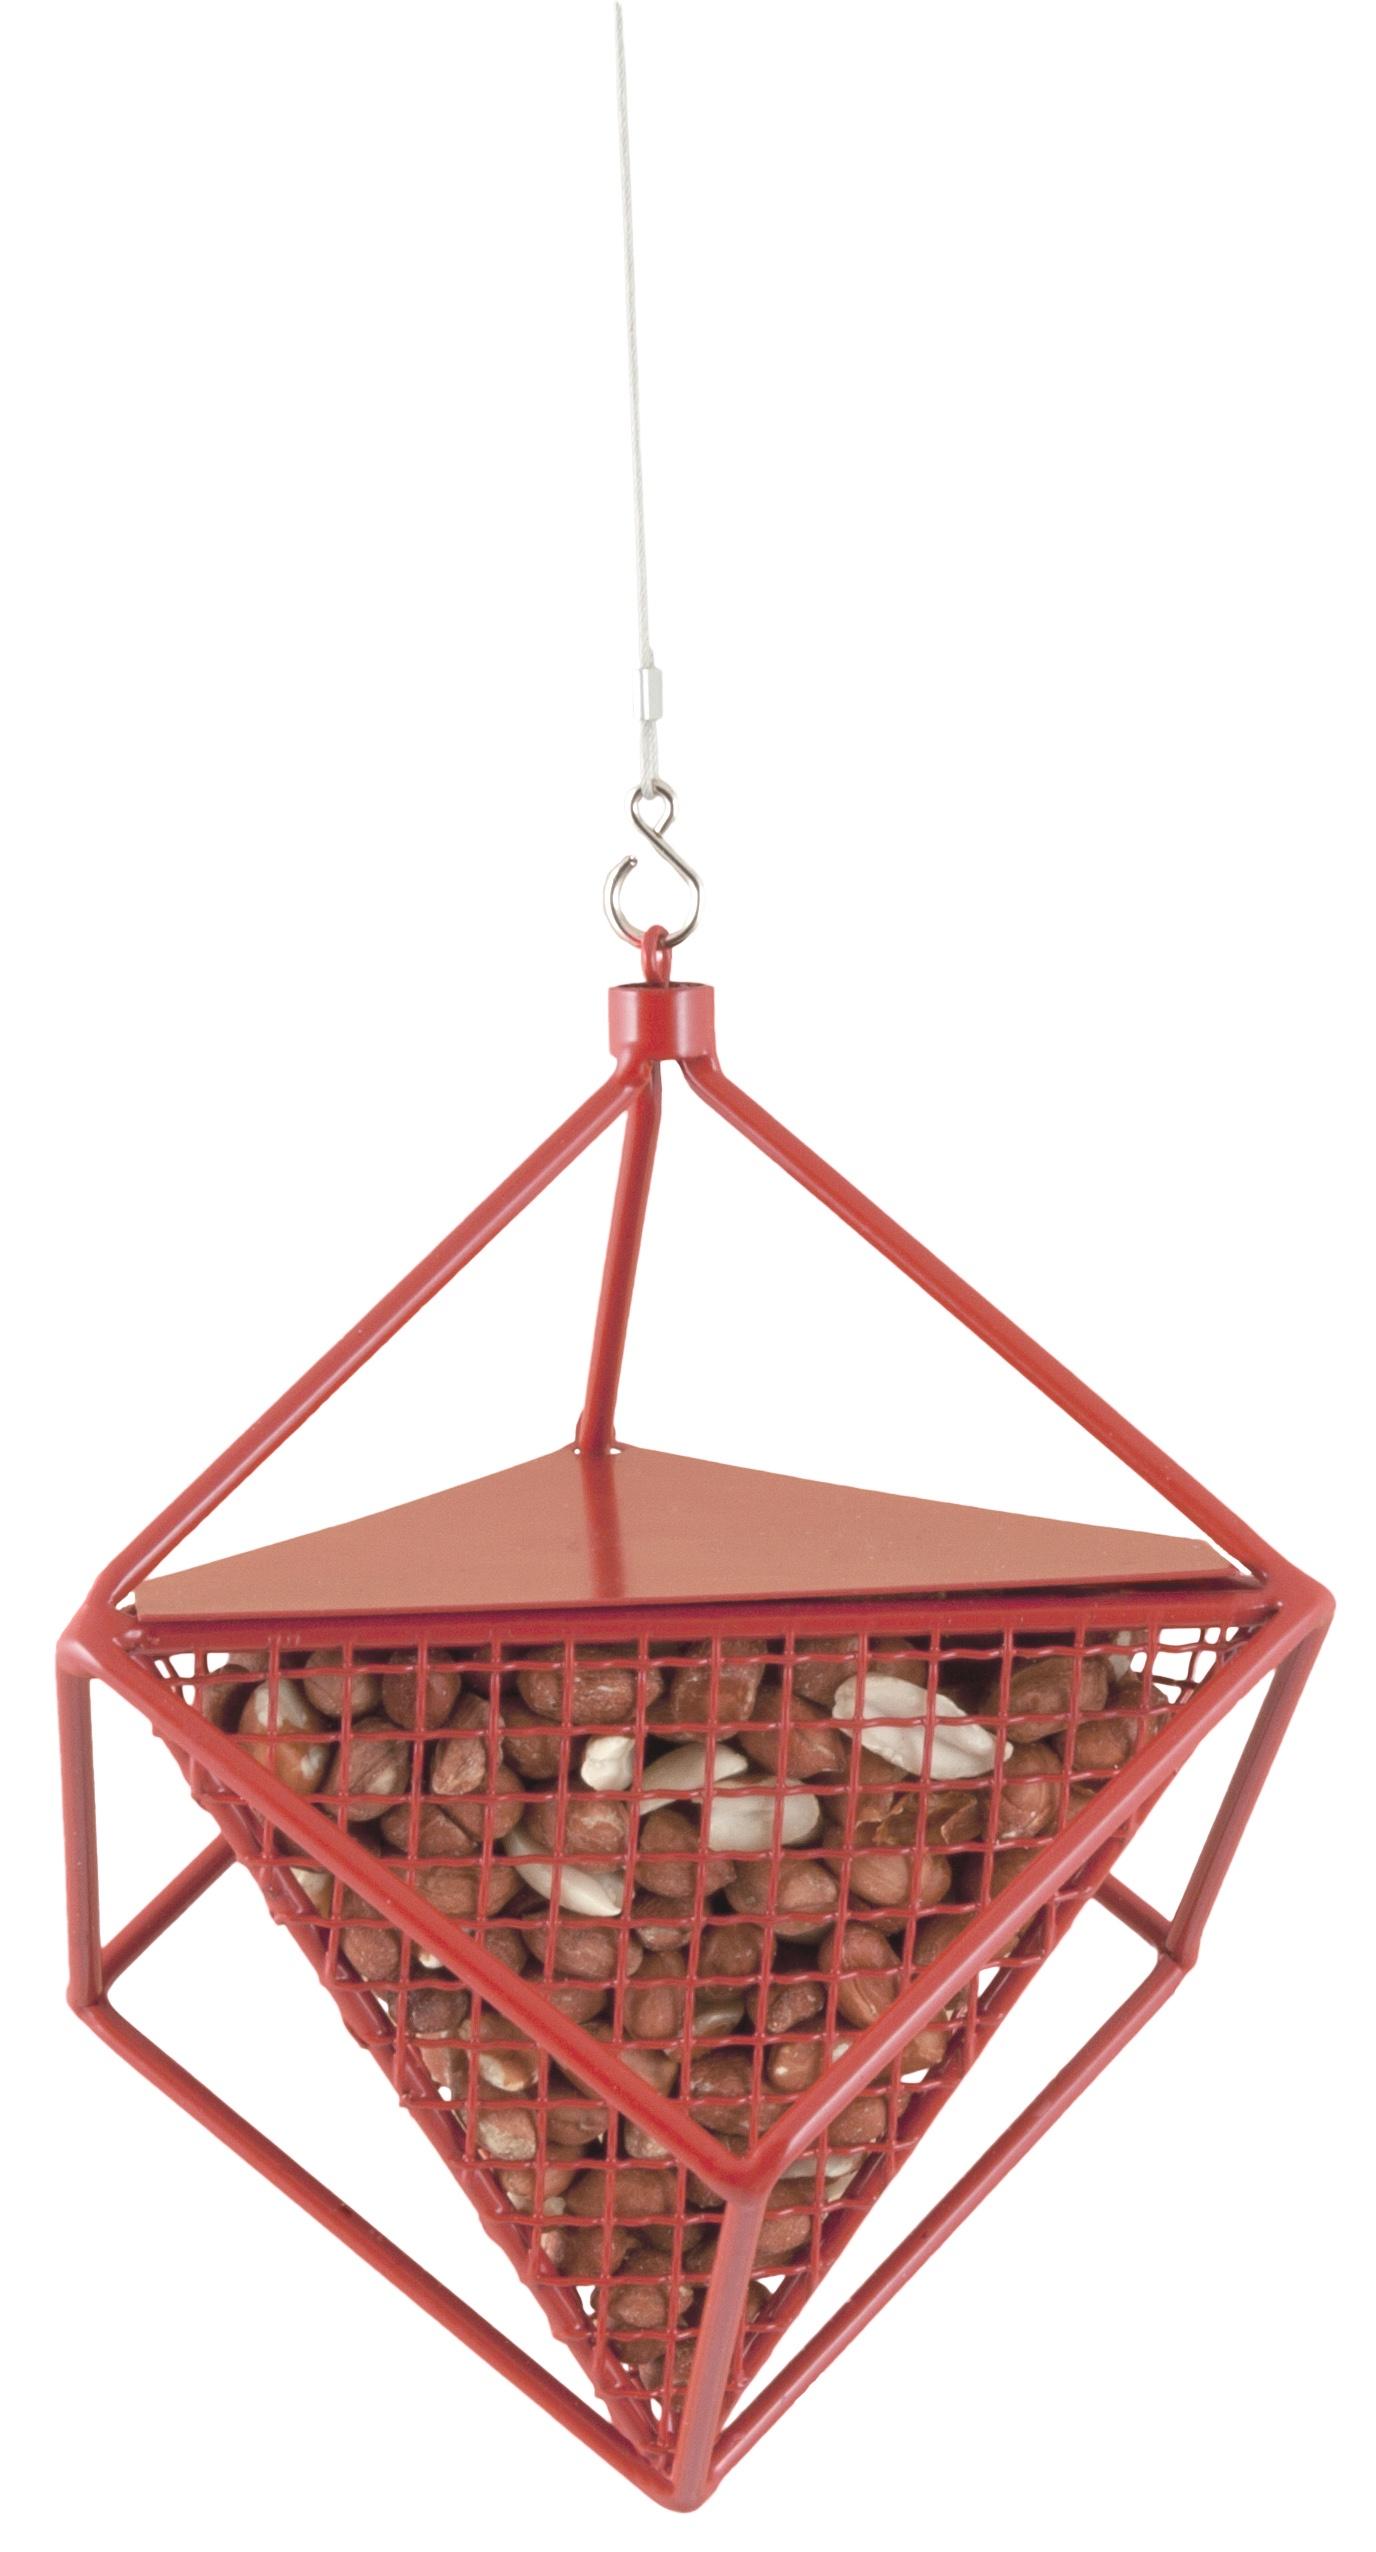 Кормушка Cube Feeder кормушка для птиц wildlife garden nuts wg321 black